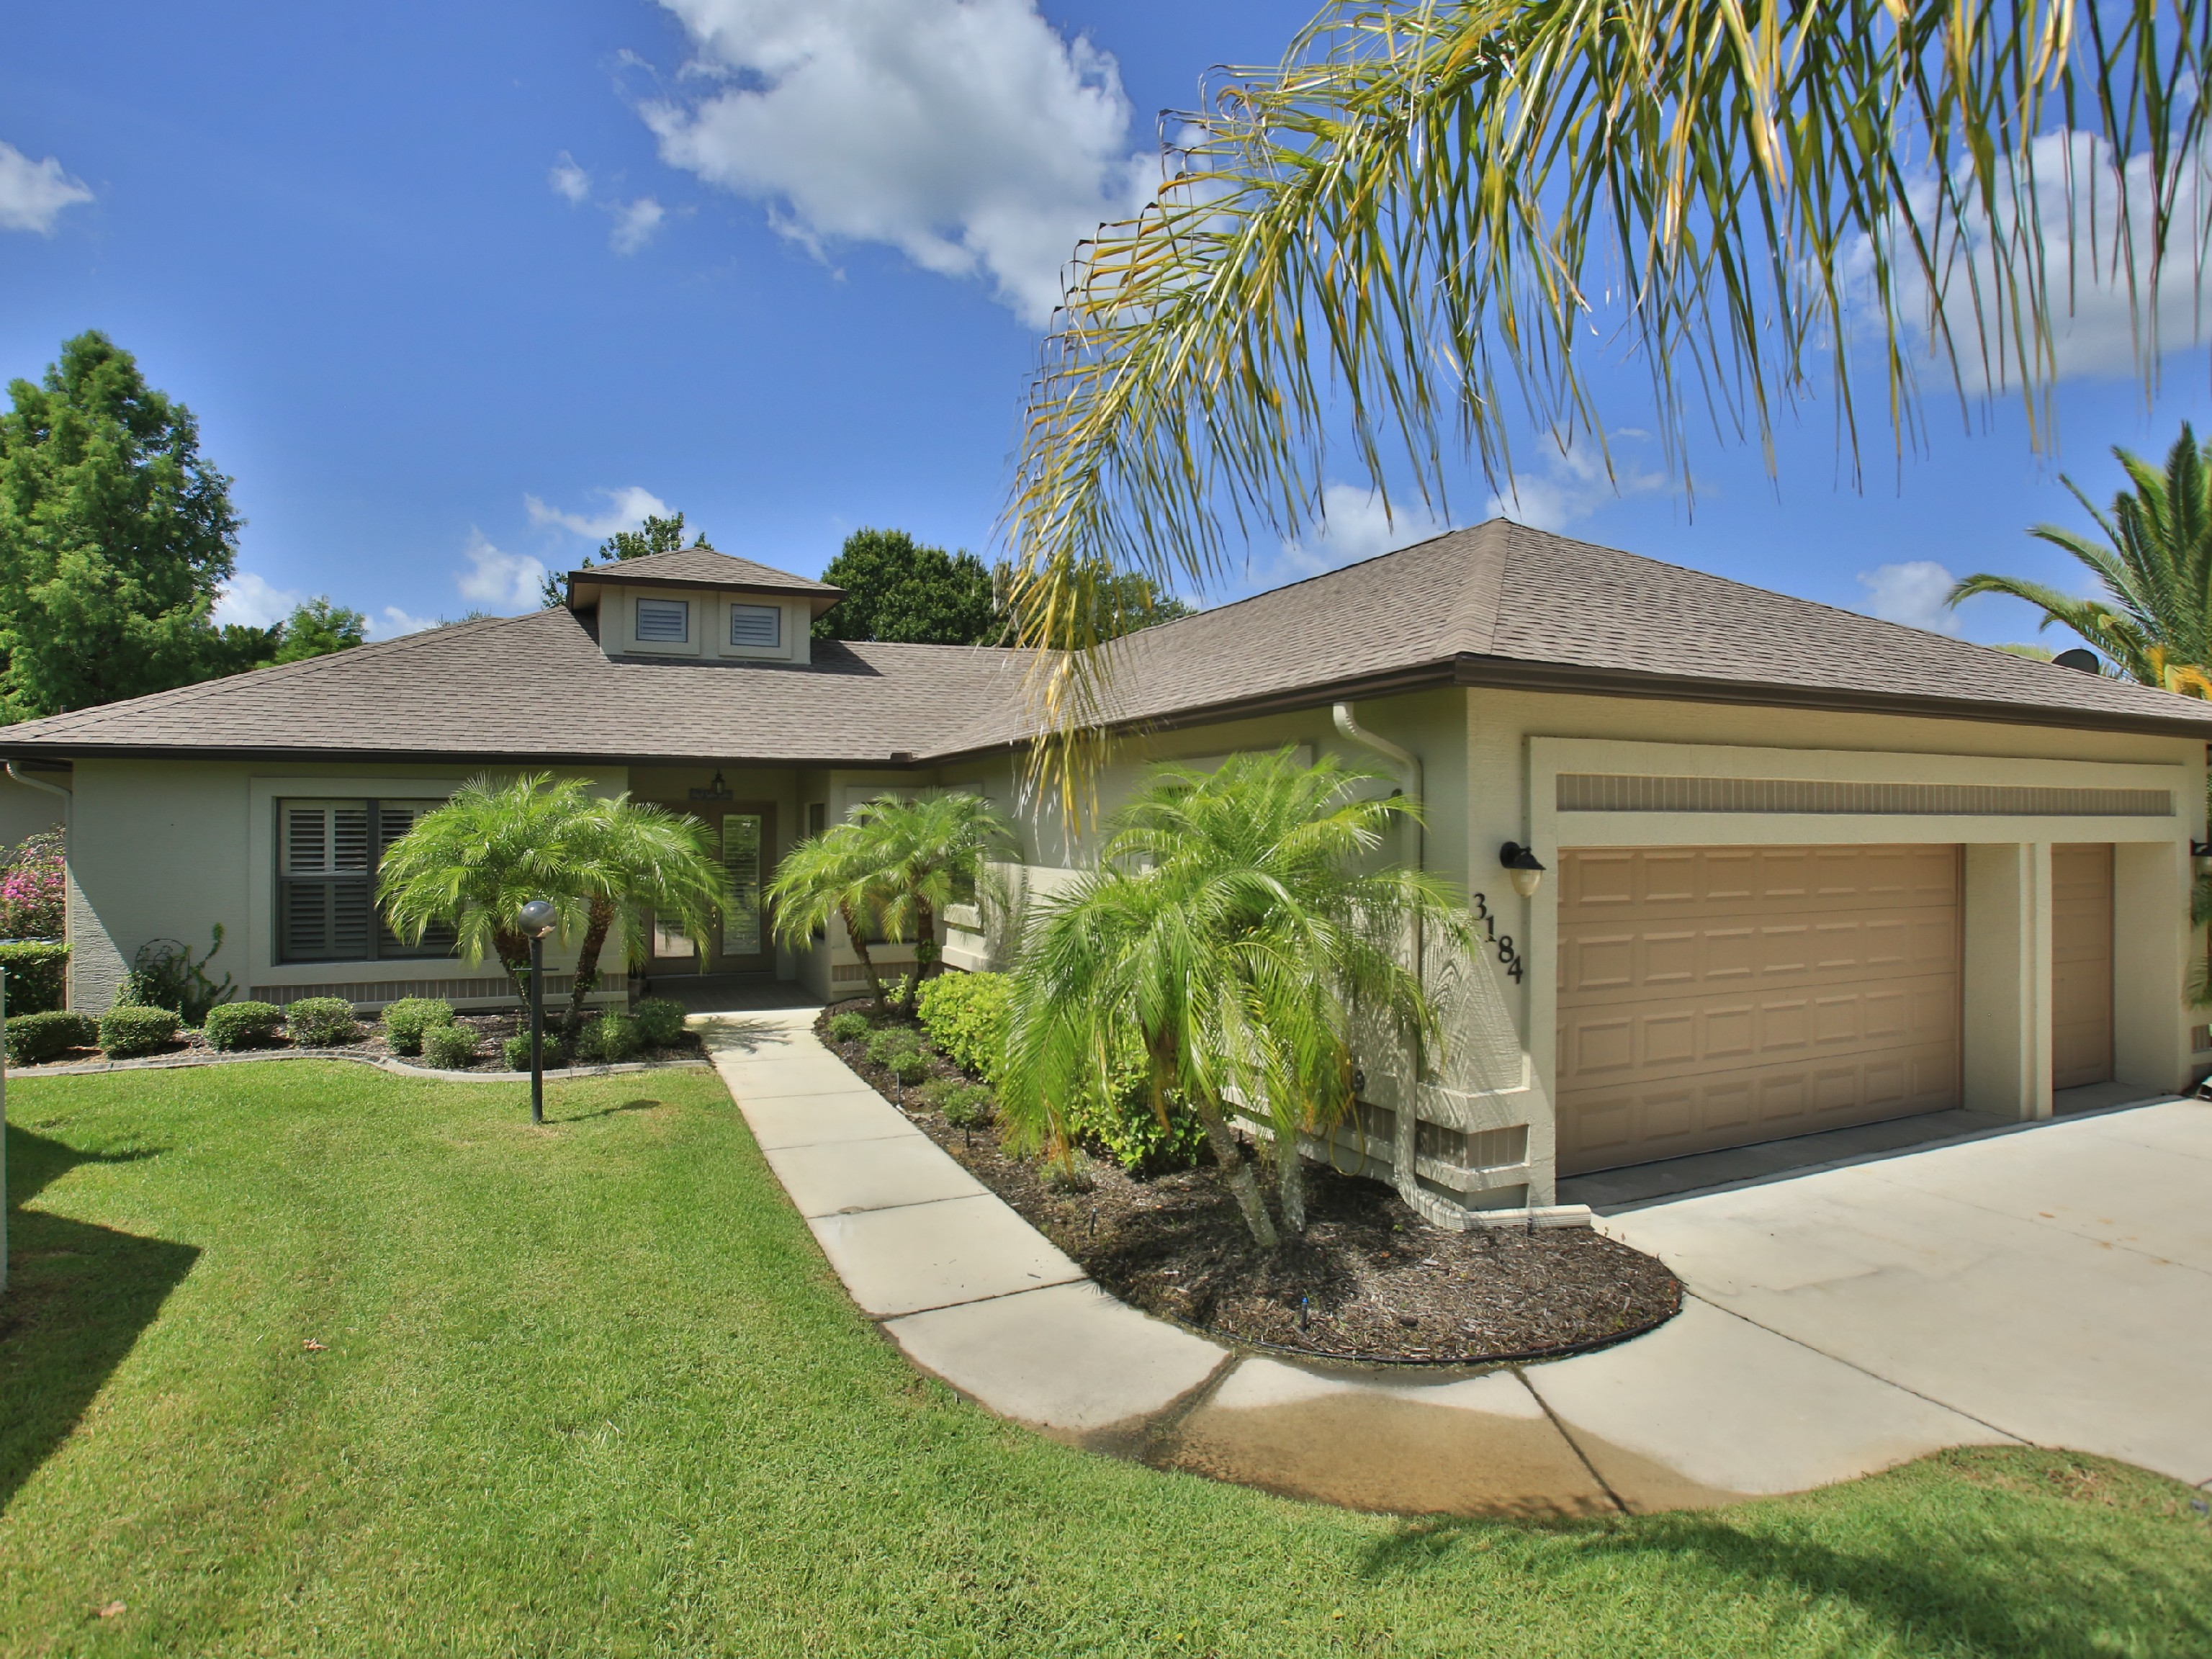 Single Family Home for Sale at Daytona Beach, Florida 3184 Royal Birkdale Way Port Orange, Florida 32128 United States